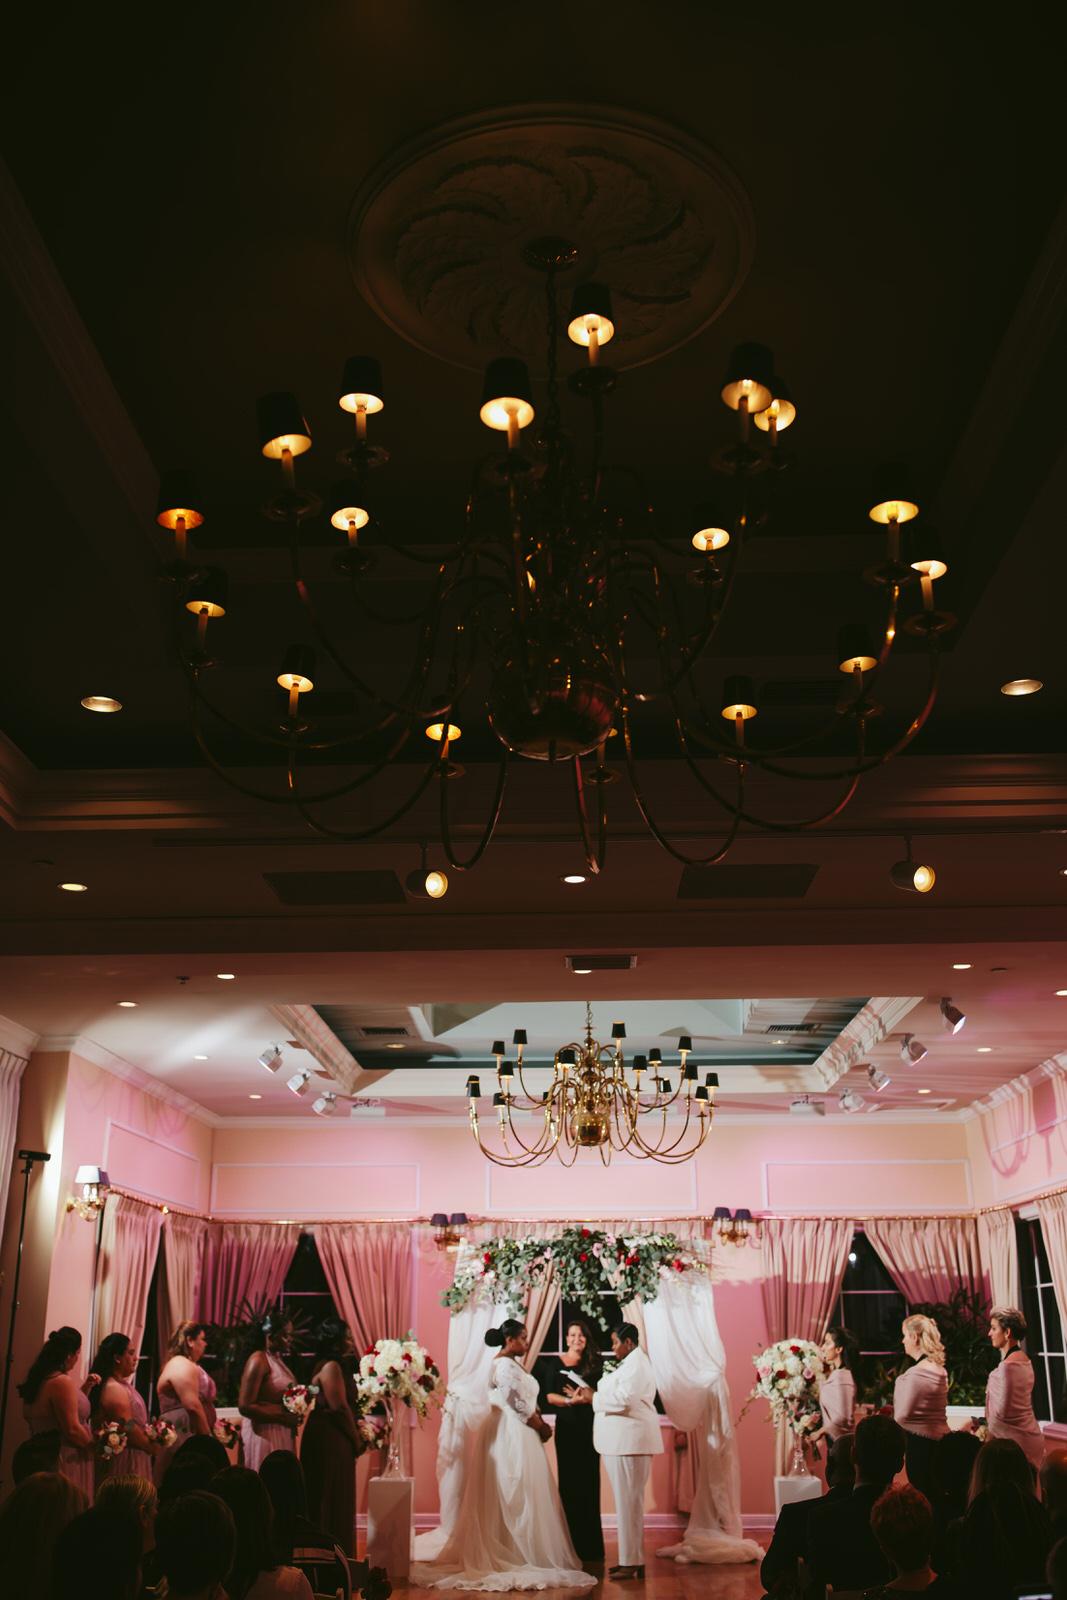 Lesbian_Ceremony_Benvenuto_Wedding_Tiny_House_Photo_Ceremony.jpg